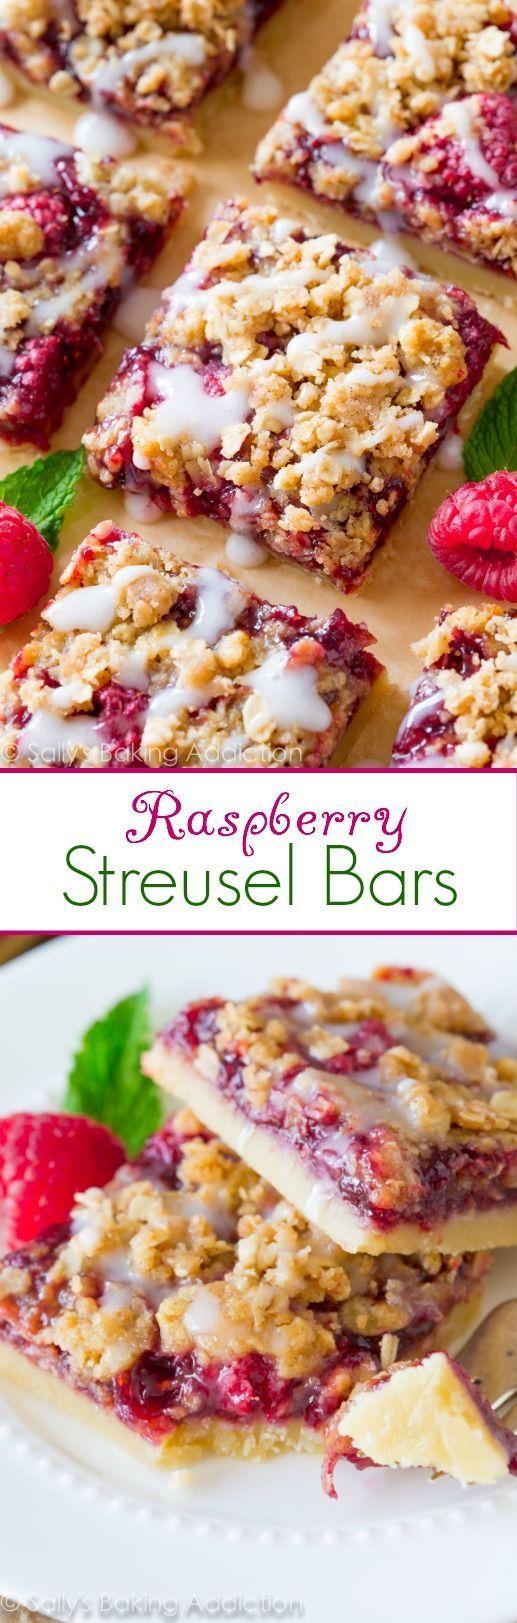 Top 25+ best Raspberry dessert recipes ideas on Pinterest